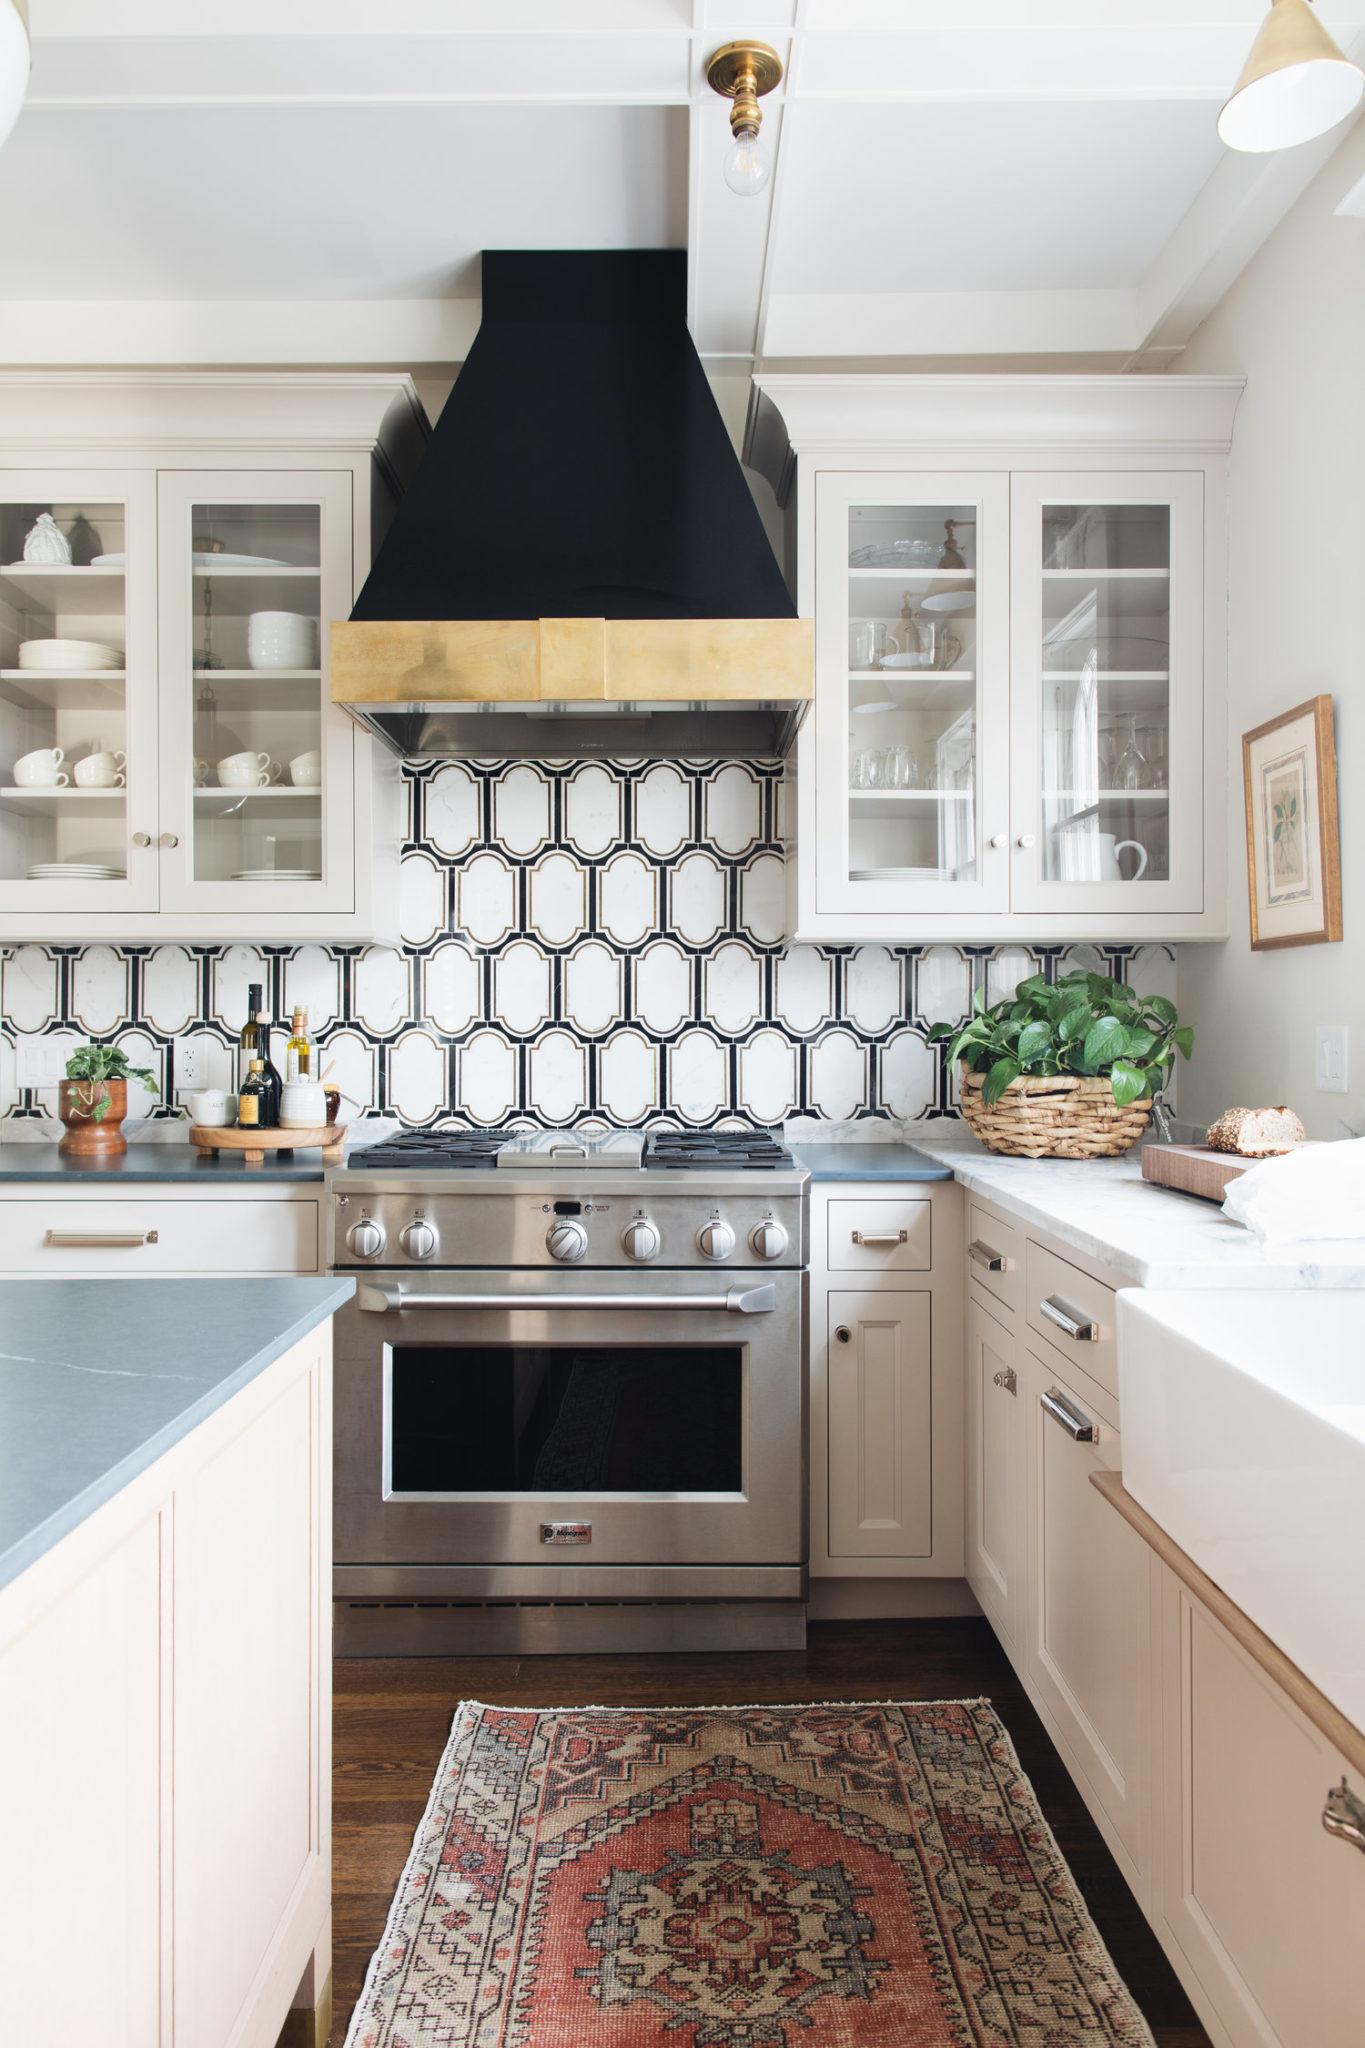 My Favorite Pins of the Week - Jean Stoffer Design - #kitchenremodel #kitchen #kitchendesign